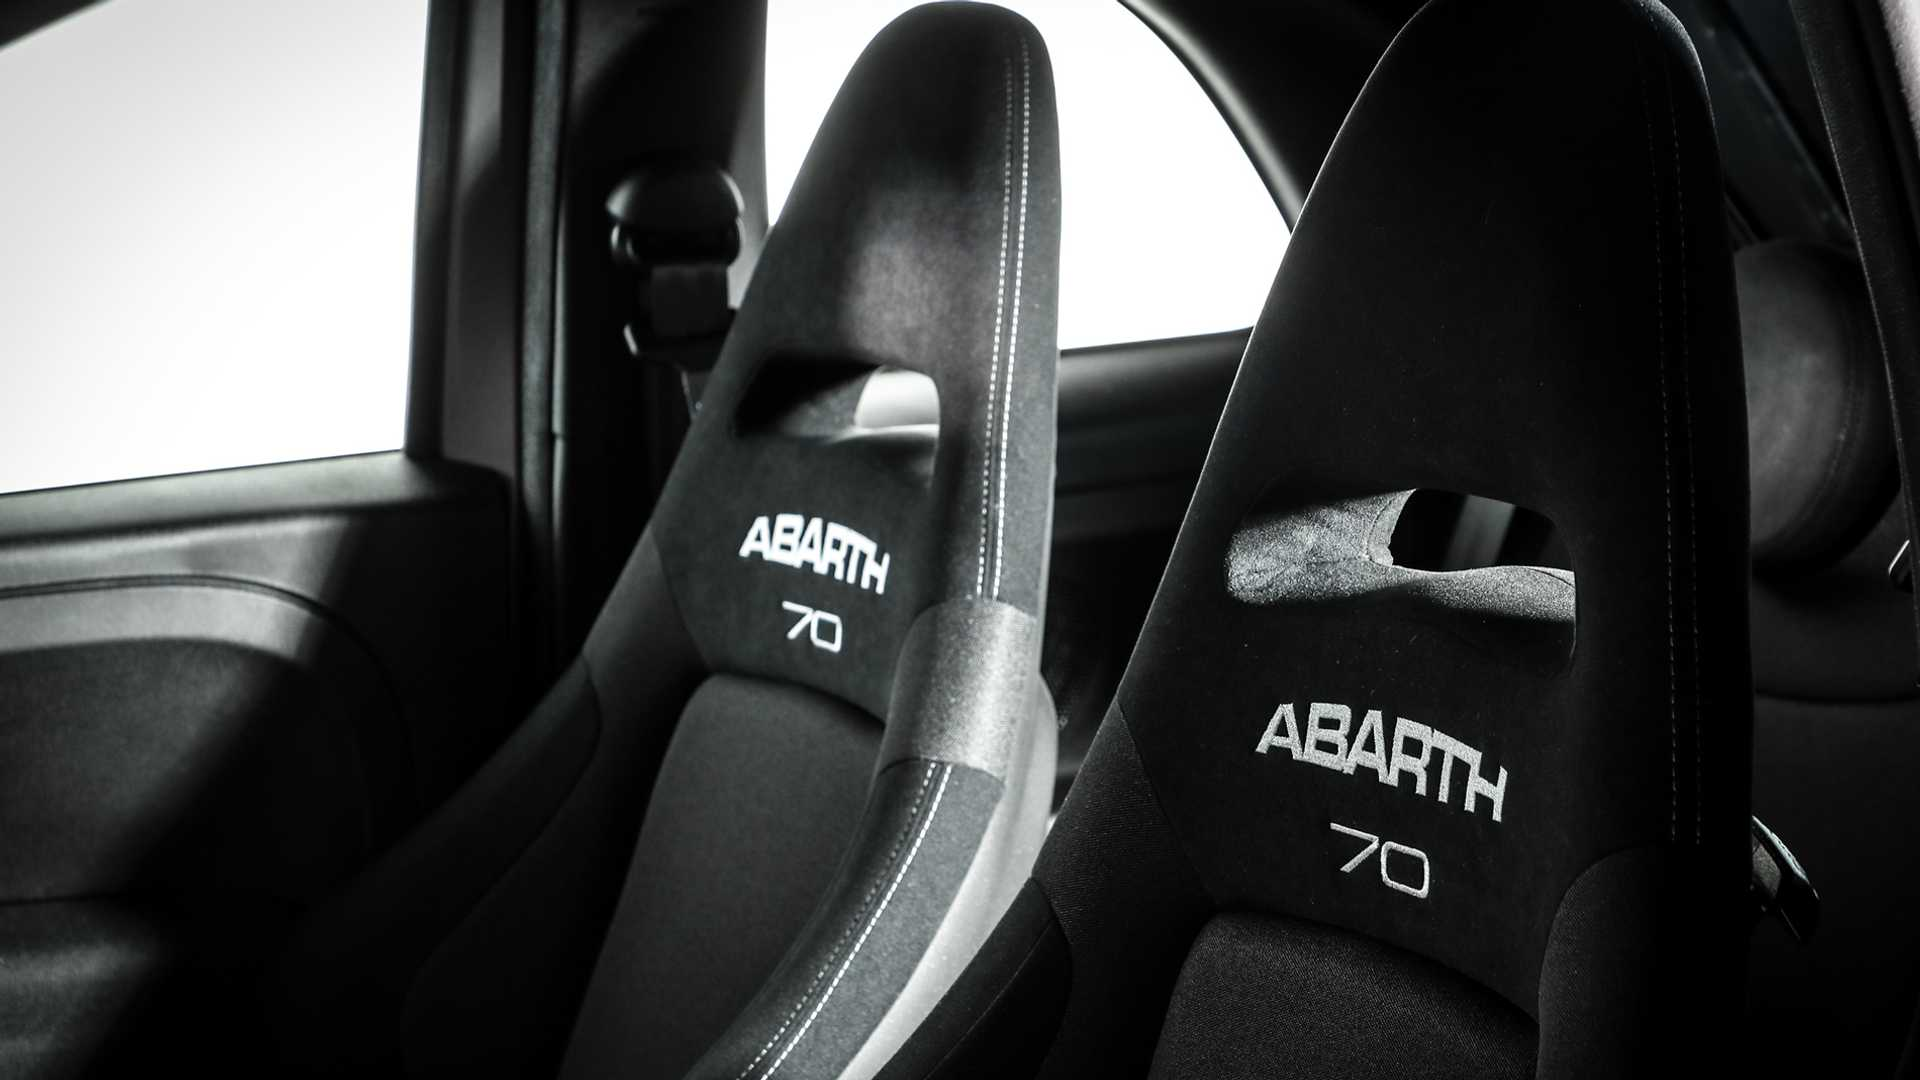 2019-abarth-595-pista-4